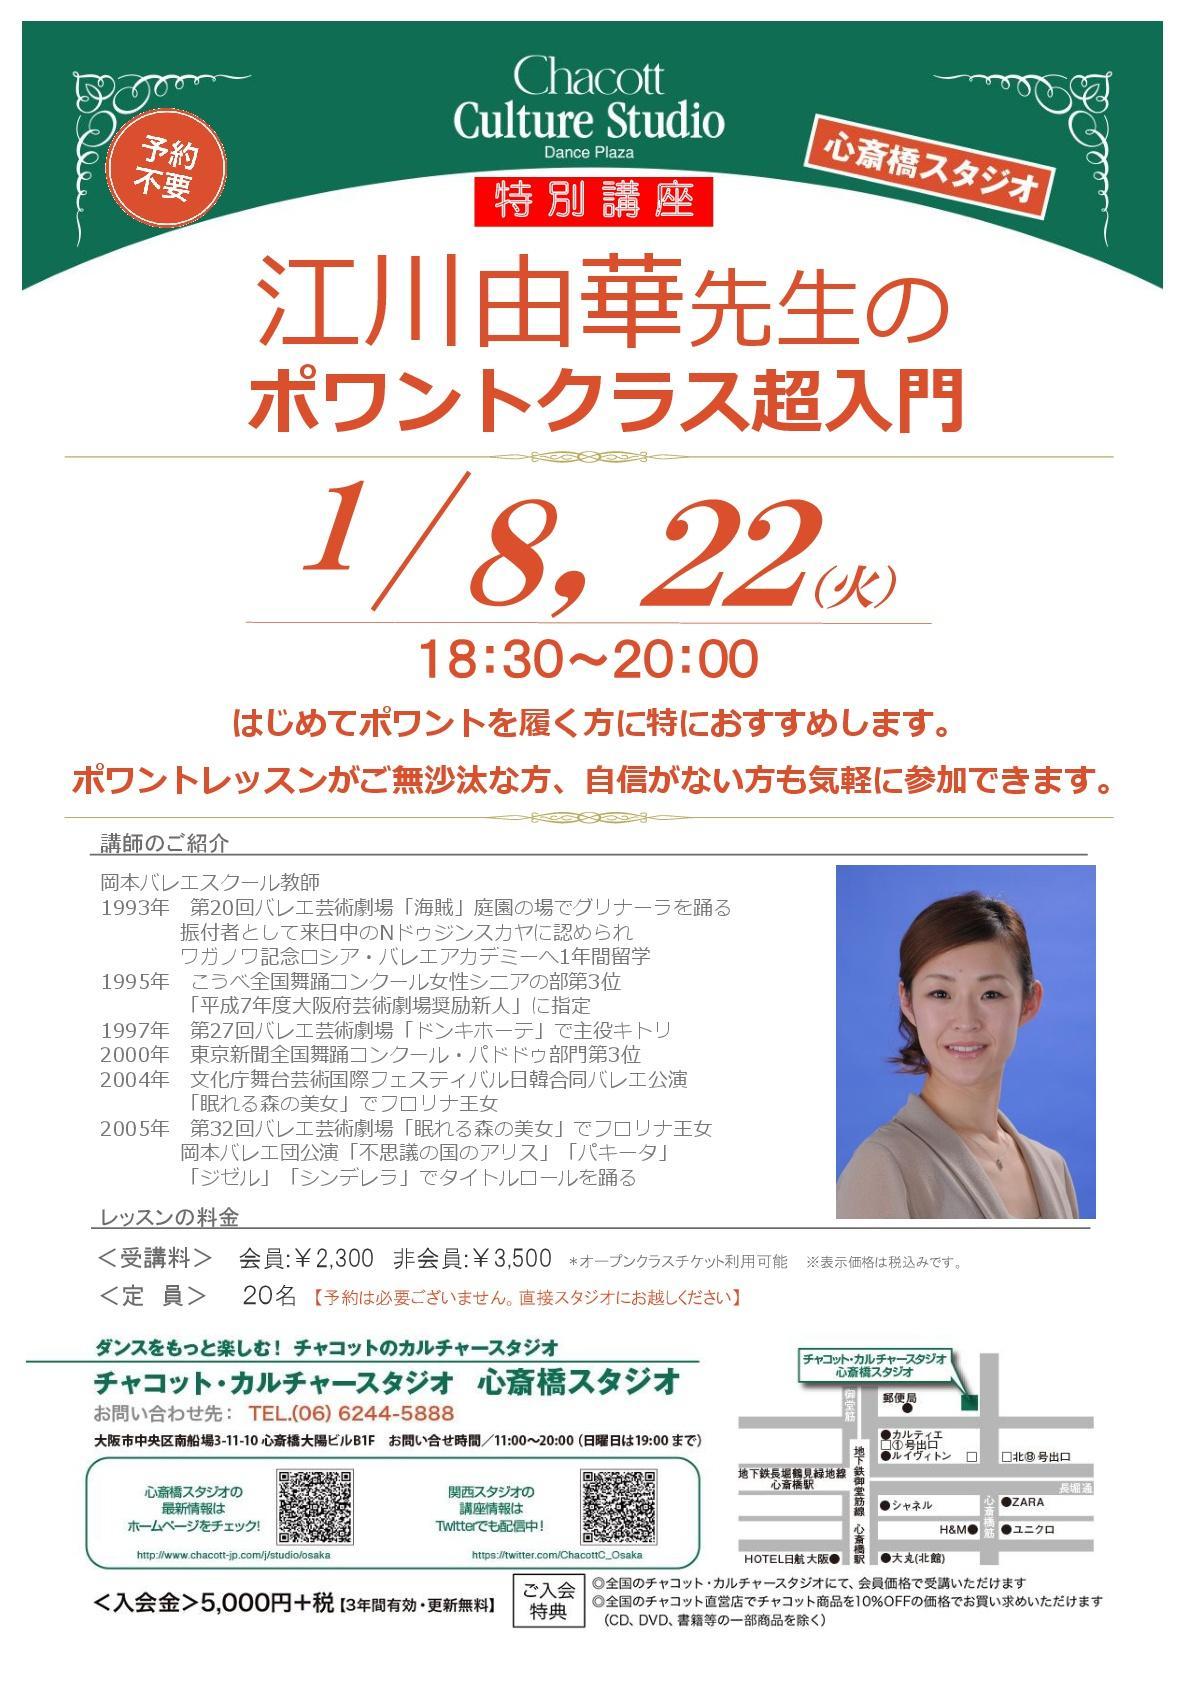 shinsaibashiS_egawa_181220.jpg